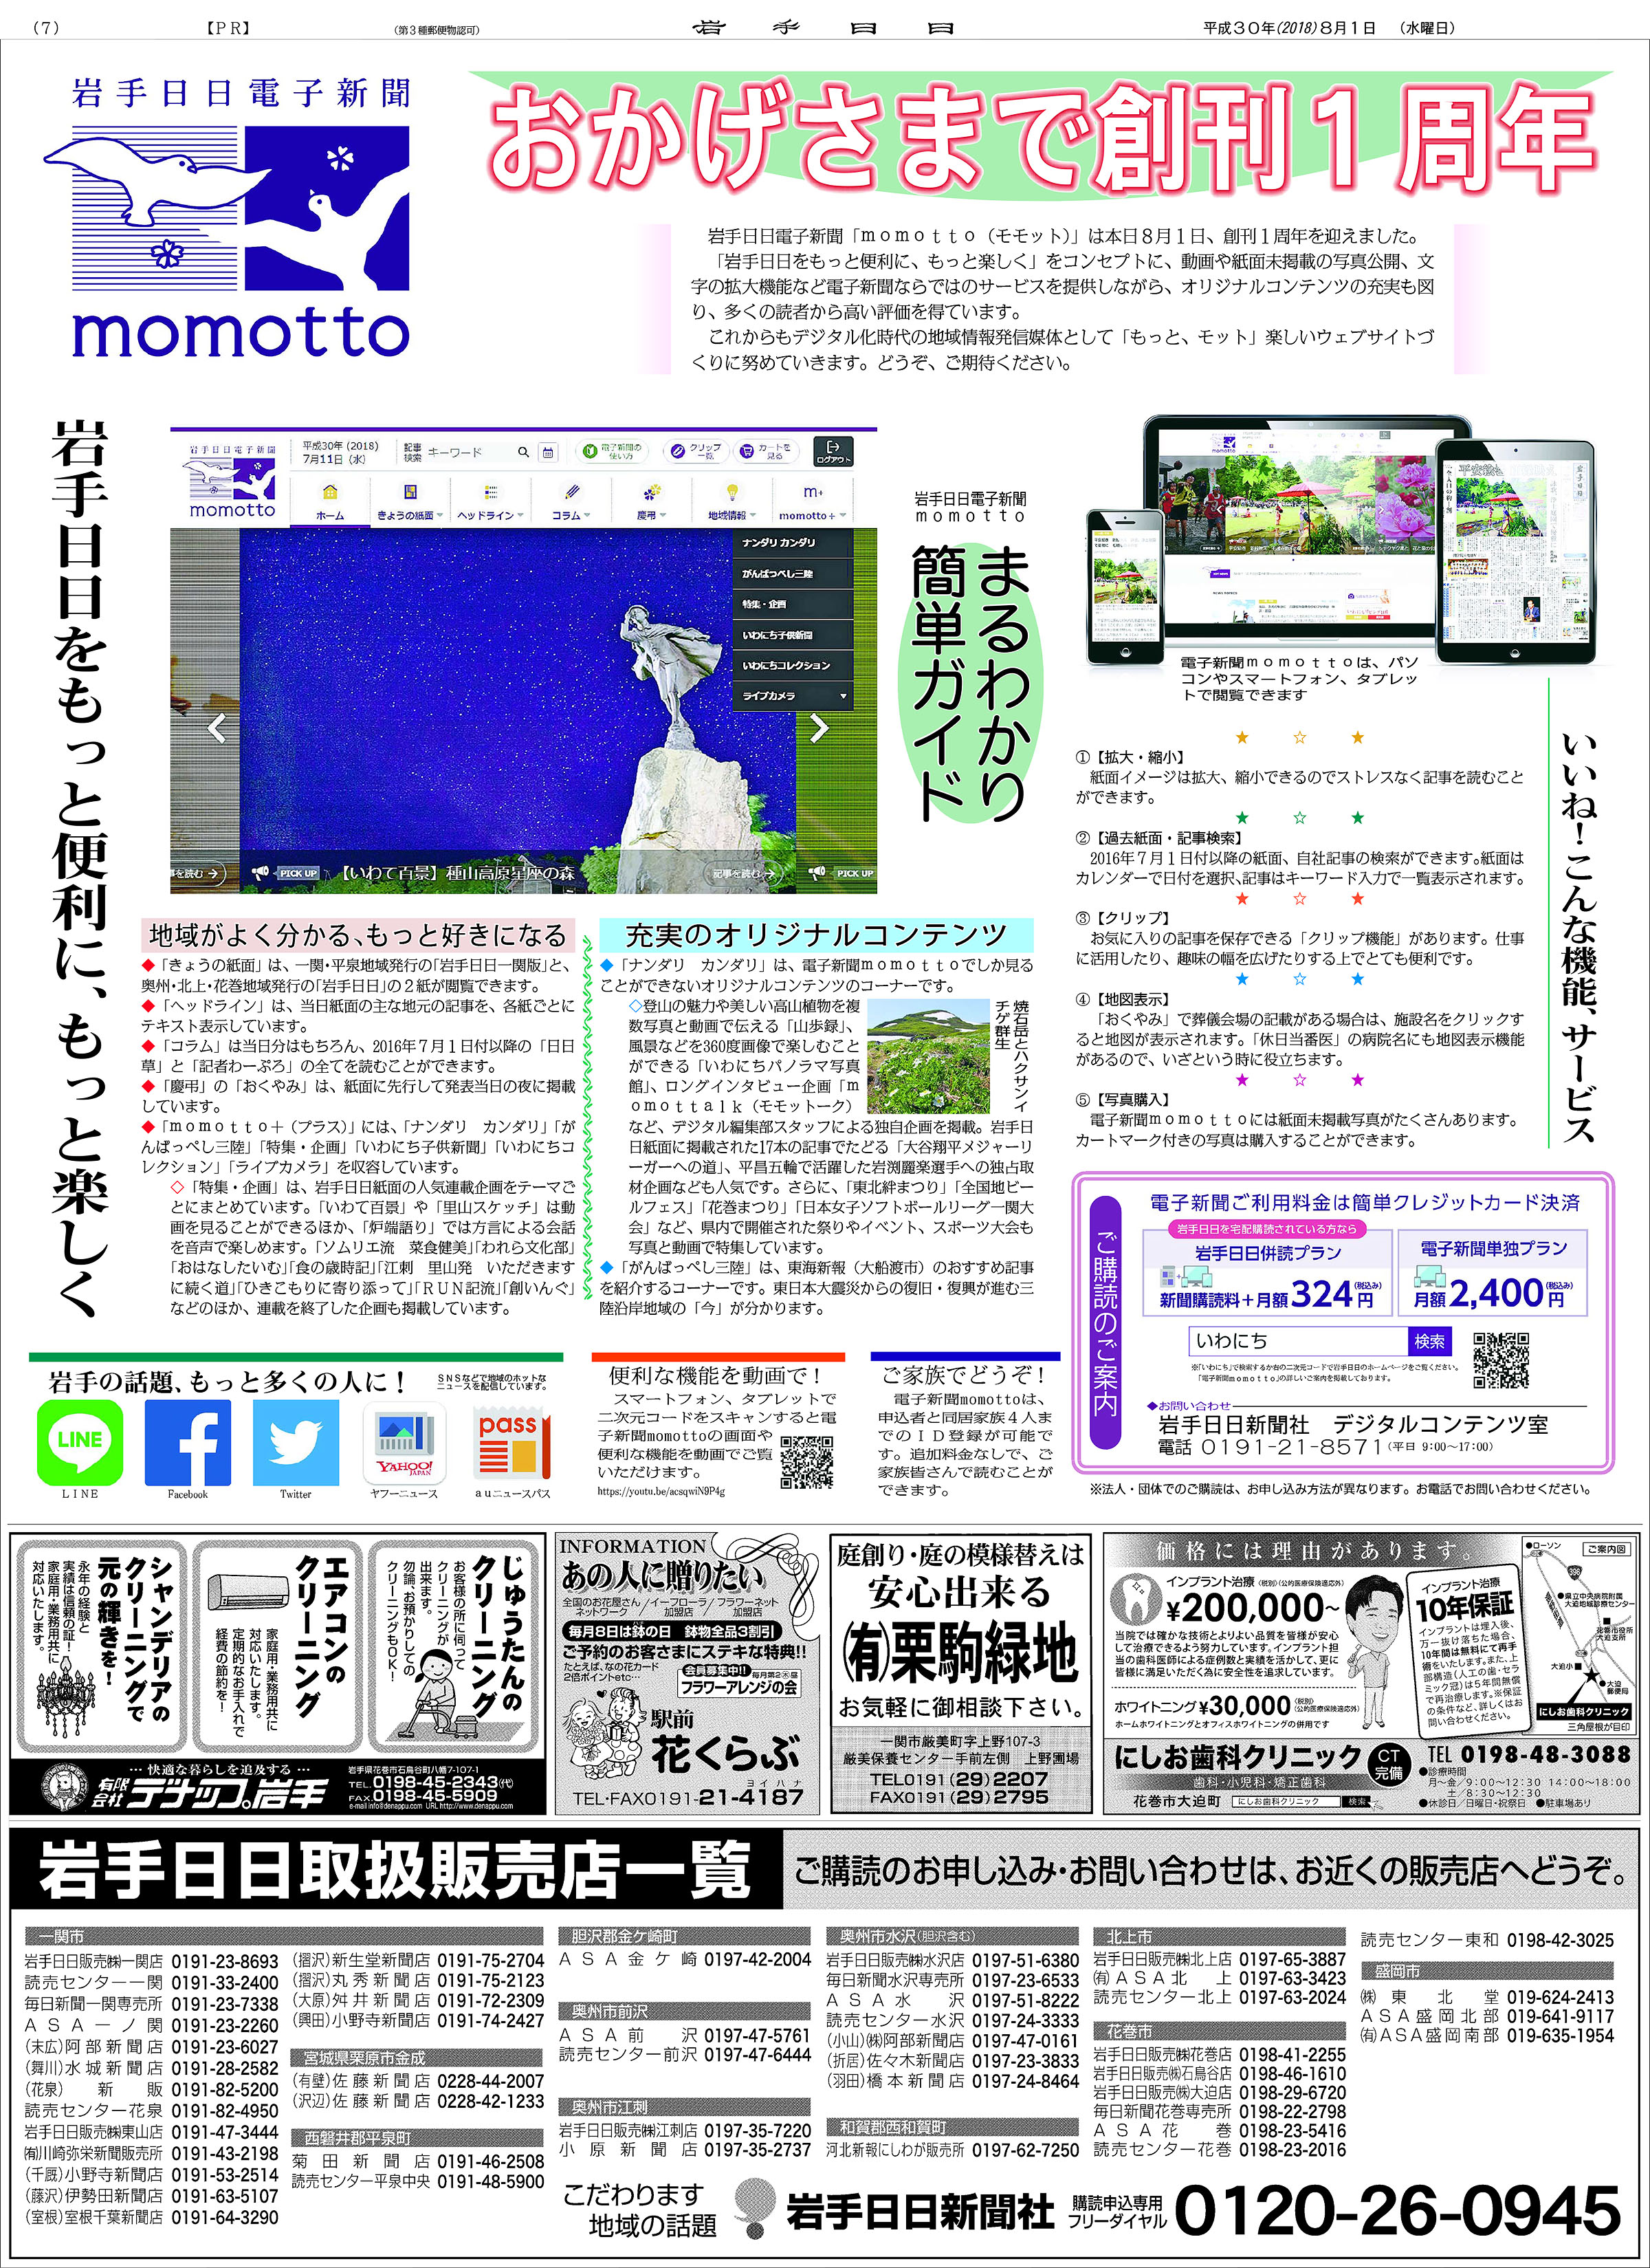 【PR】岩手日日電子新聞momotto